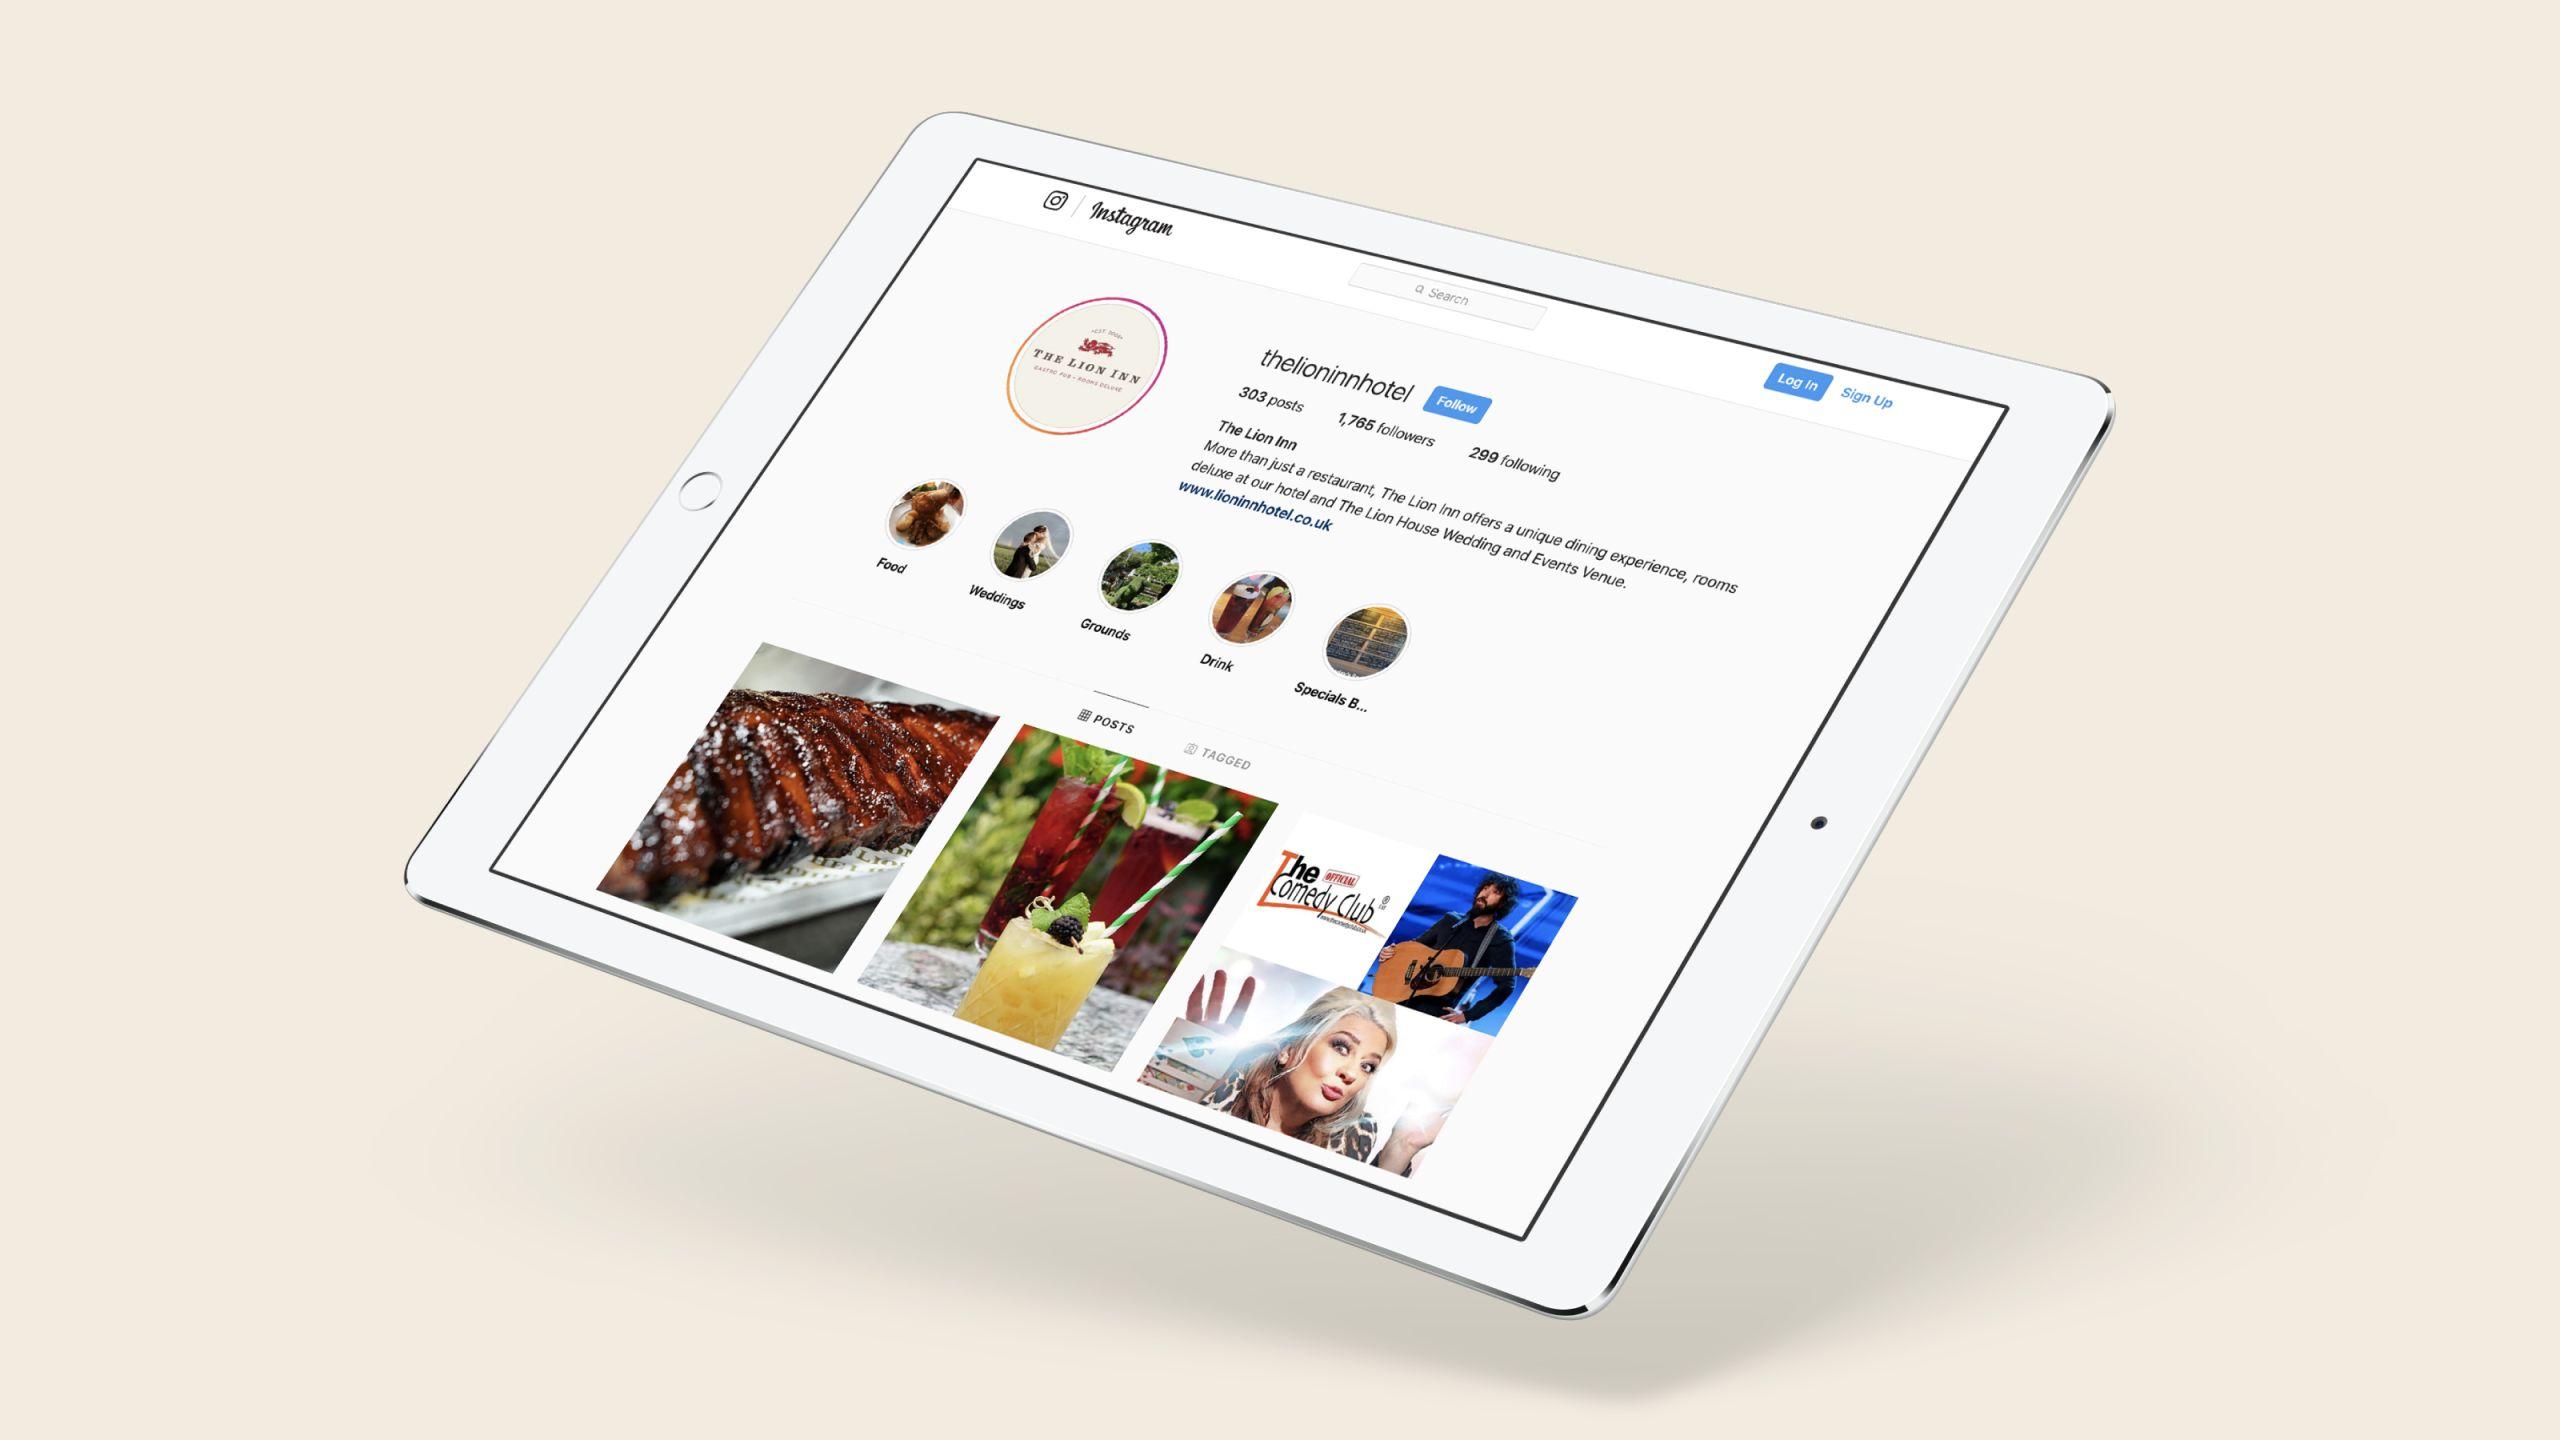 The Lion Inn Instagram profile on a tablet